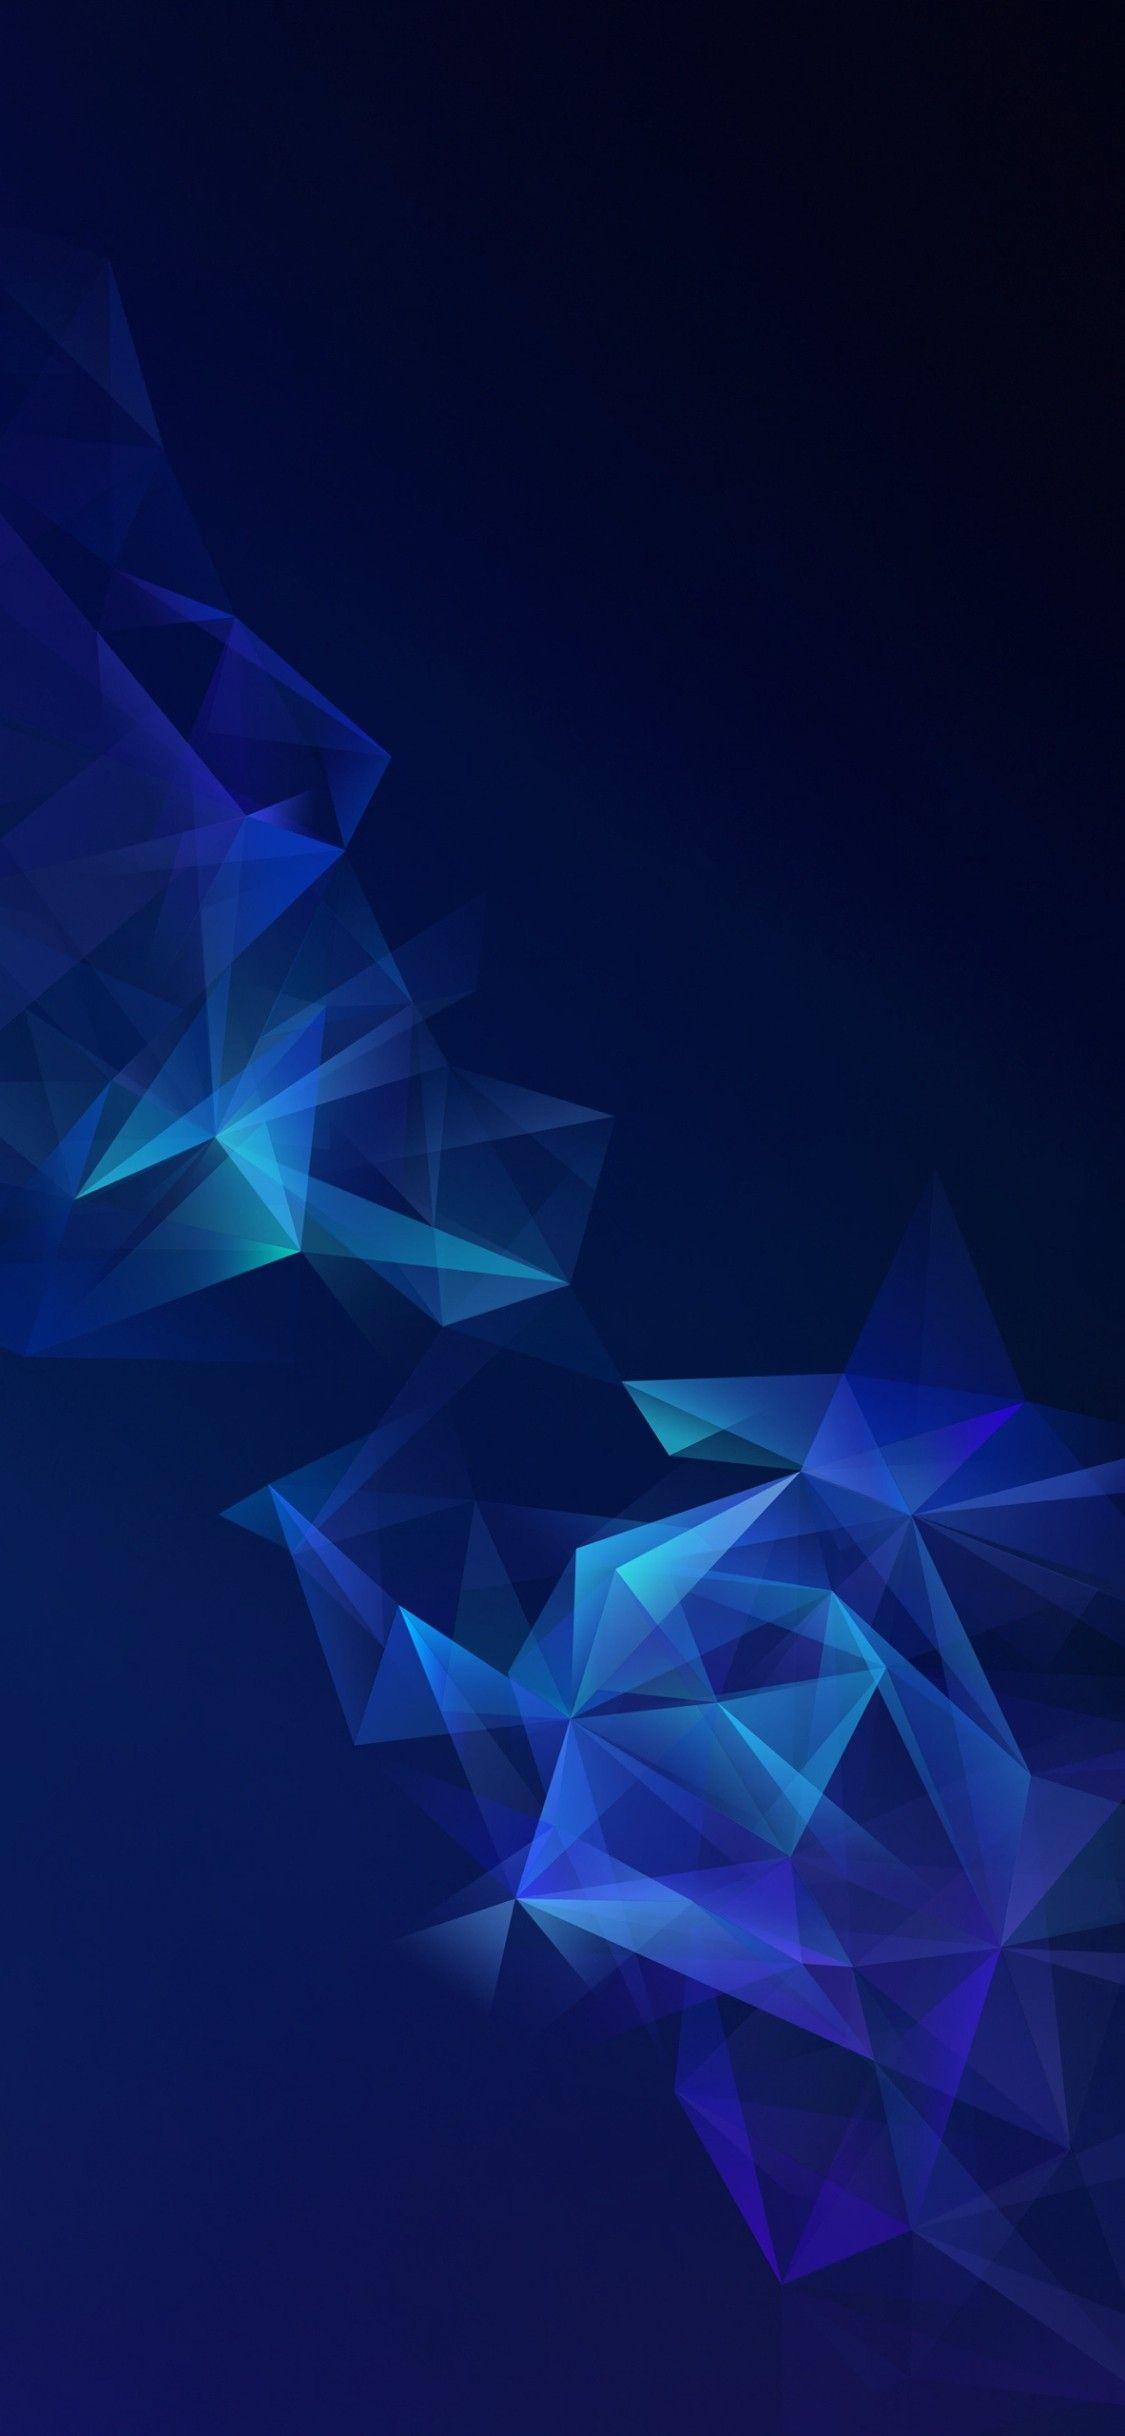 Blue, s9, s9 plus, wallpaper, galaxy, colour, abstract, digital art, s8, s9, walls, Samsung ...